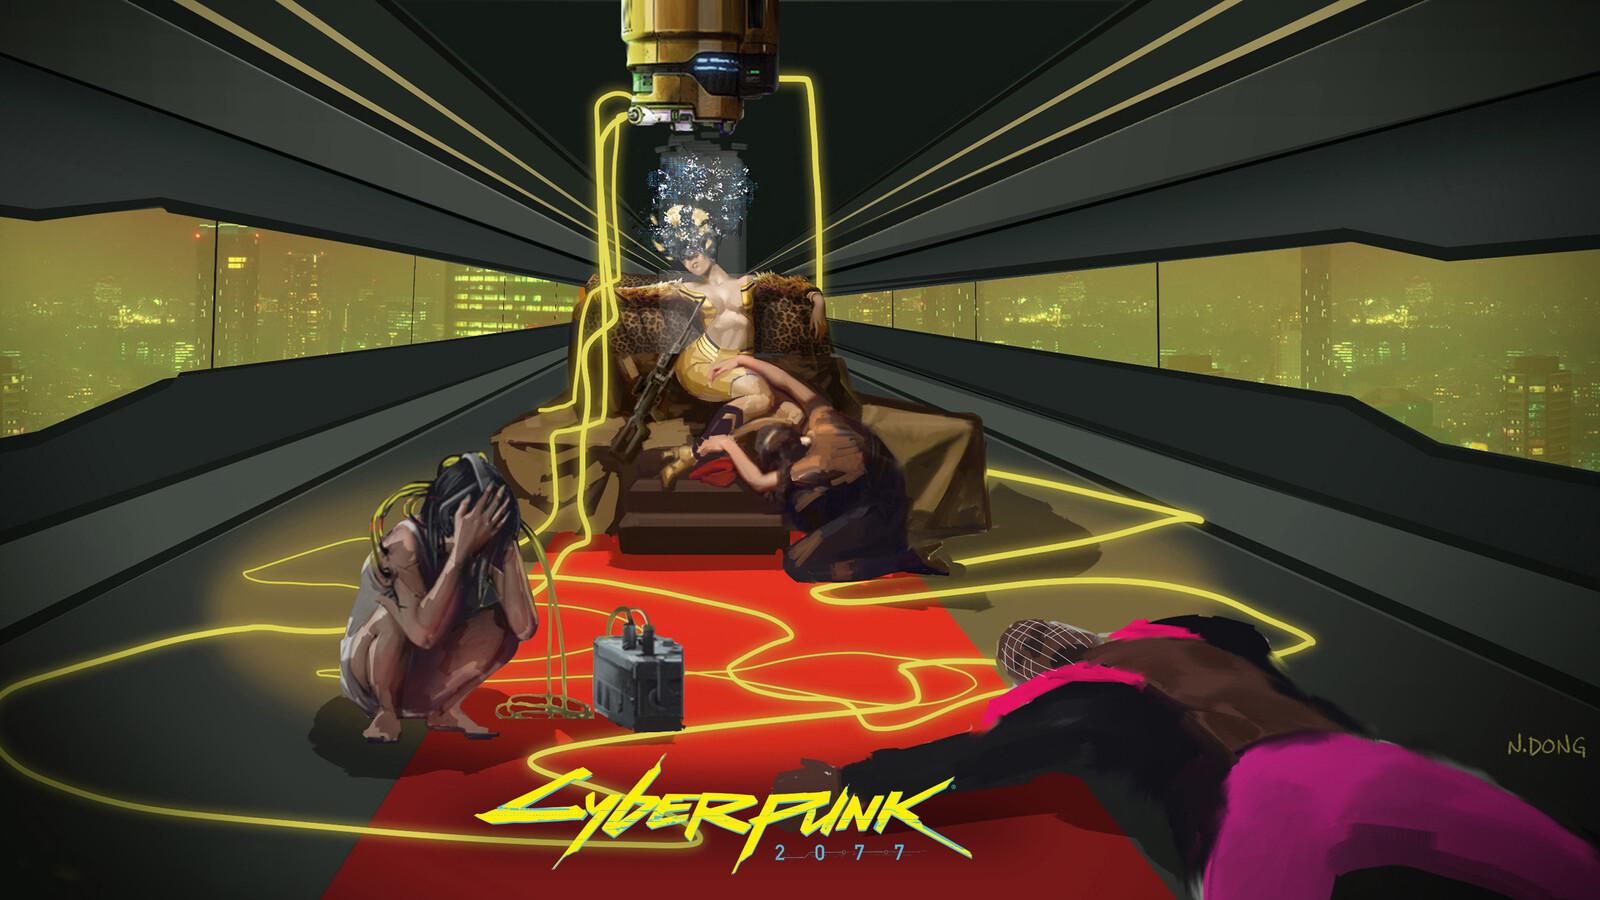 Cyberpunk 2077 - Wasted Youth